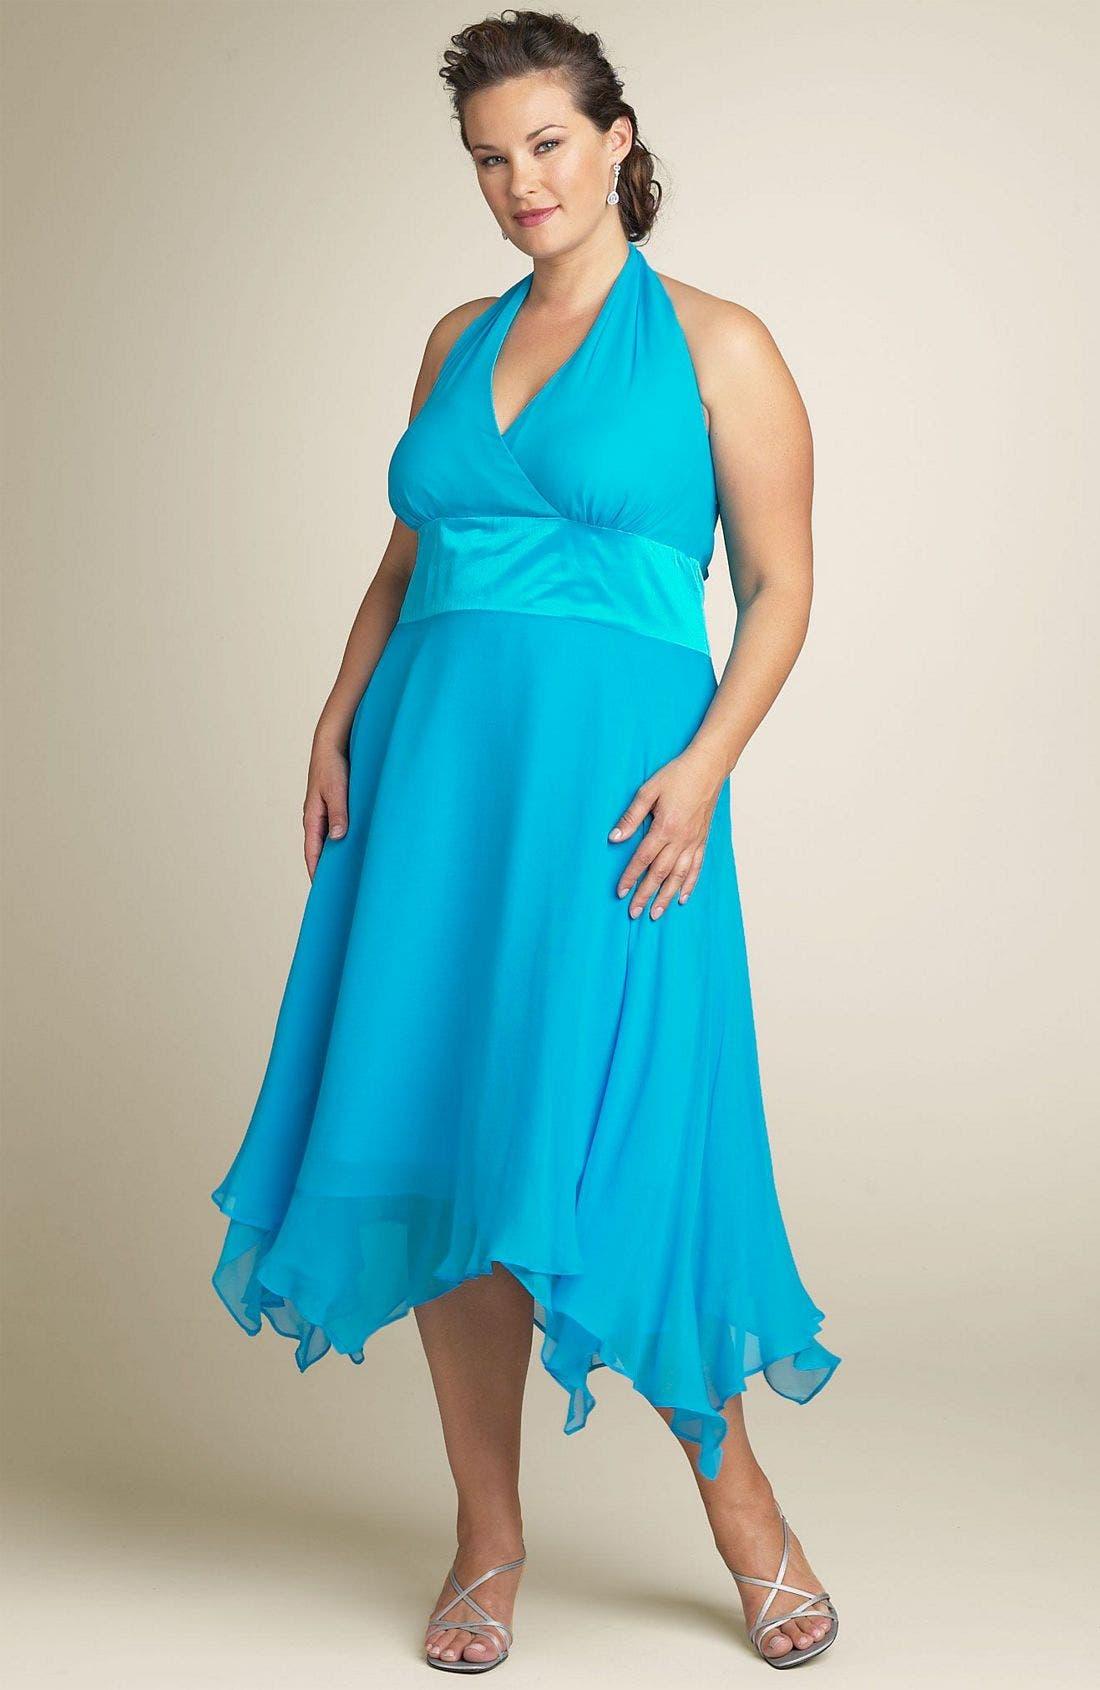 Alternate Image 1 Selected - Donna Ricco Halter Dress (Plus Size)